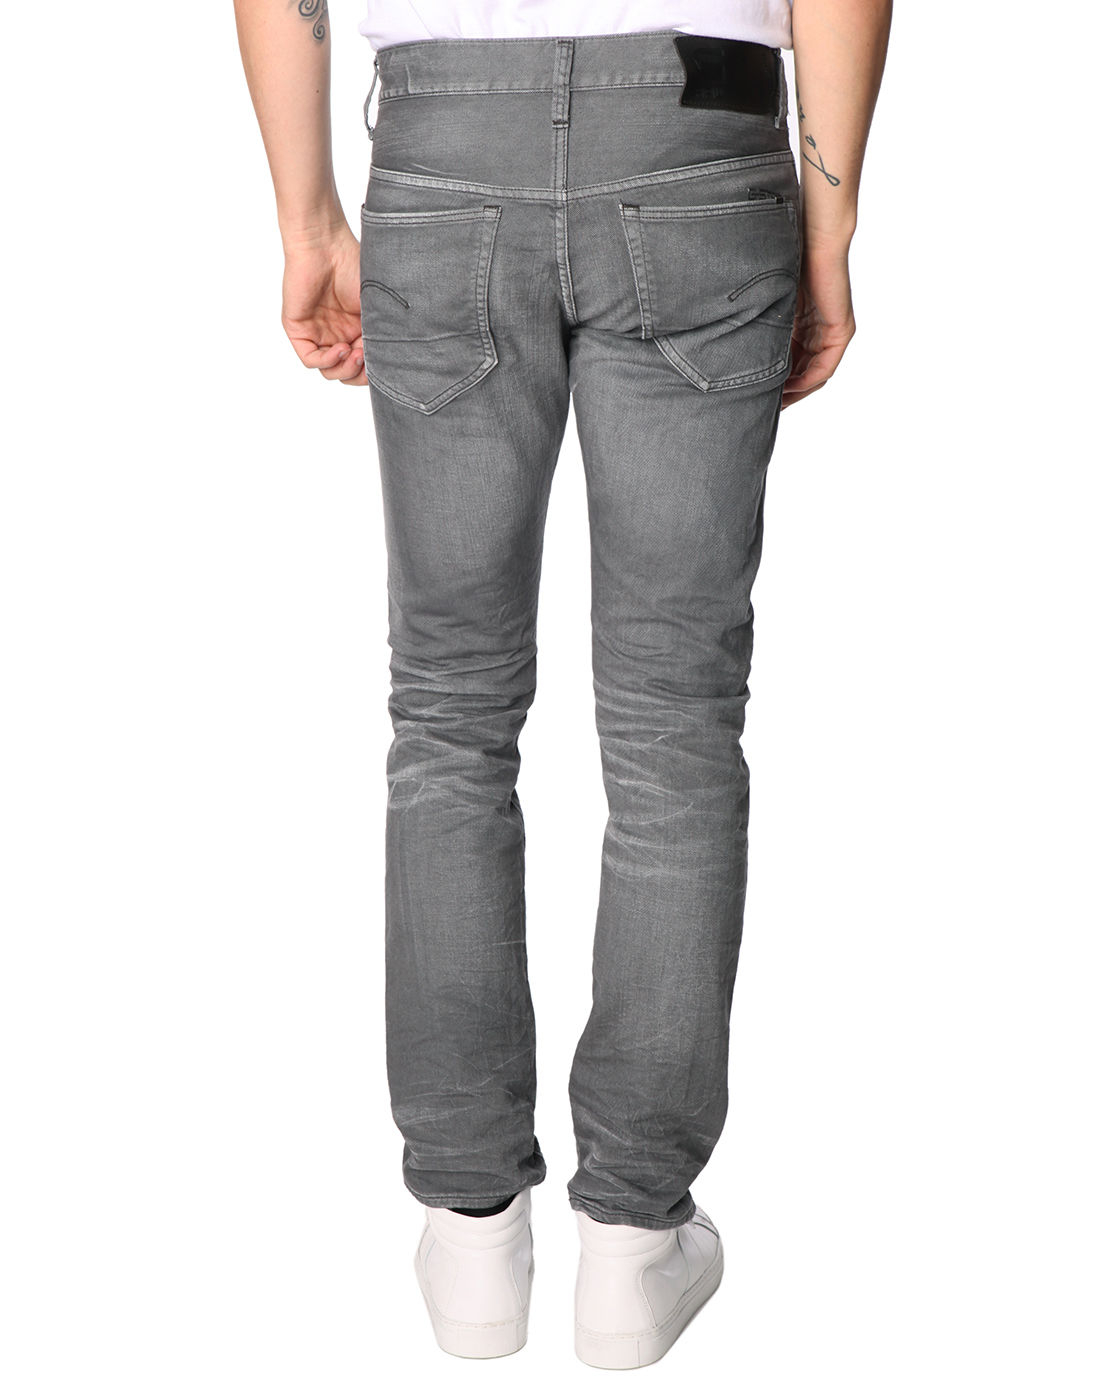 g star raw 3301 super slim fit grey jeans in gray for men. Black Bedroom Furniture Sets. Home Design Ideas